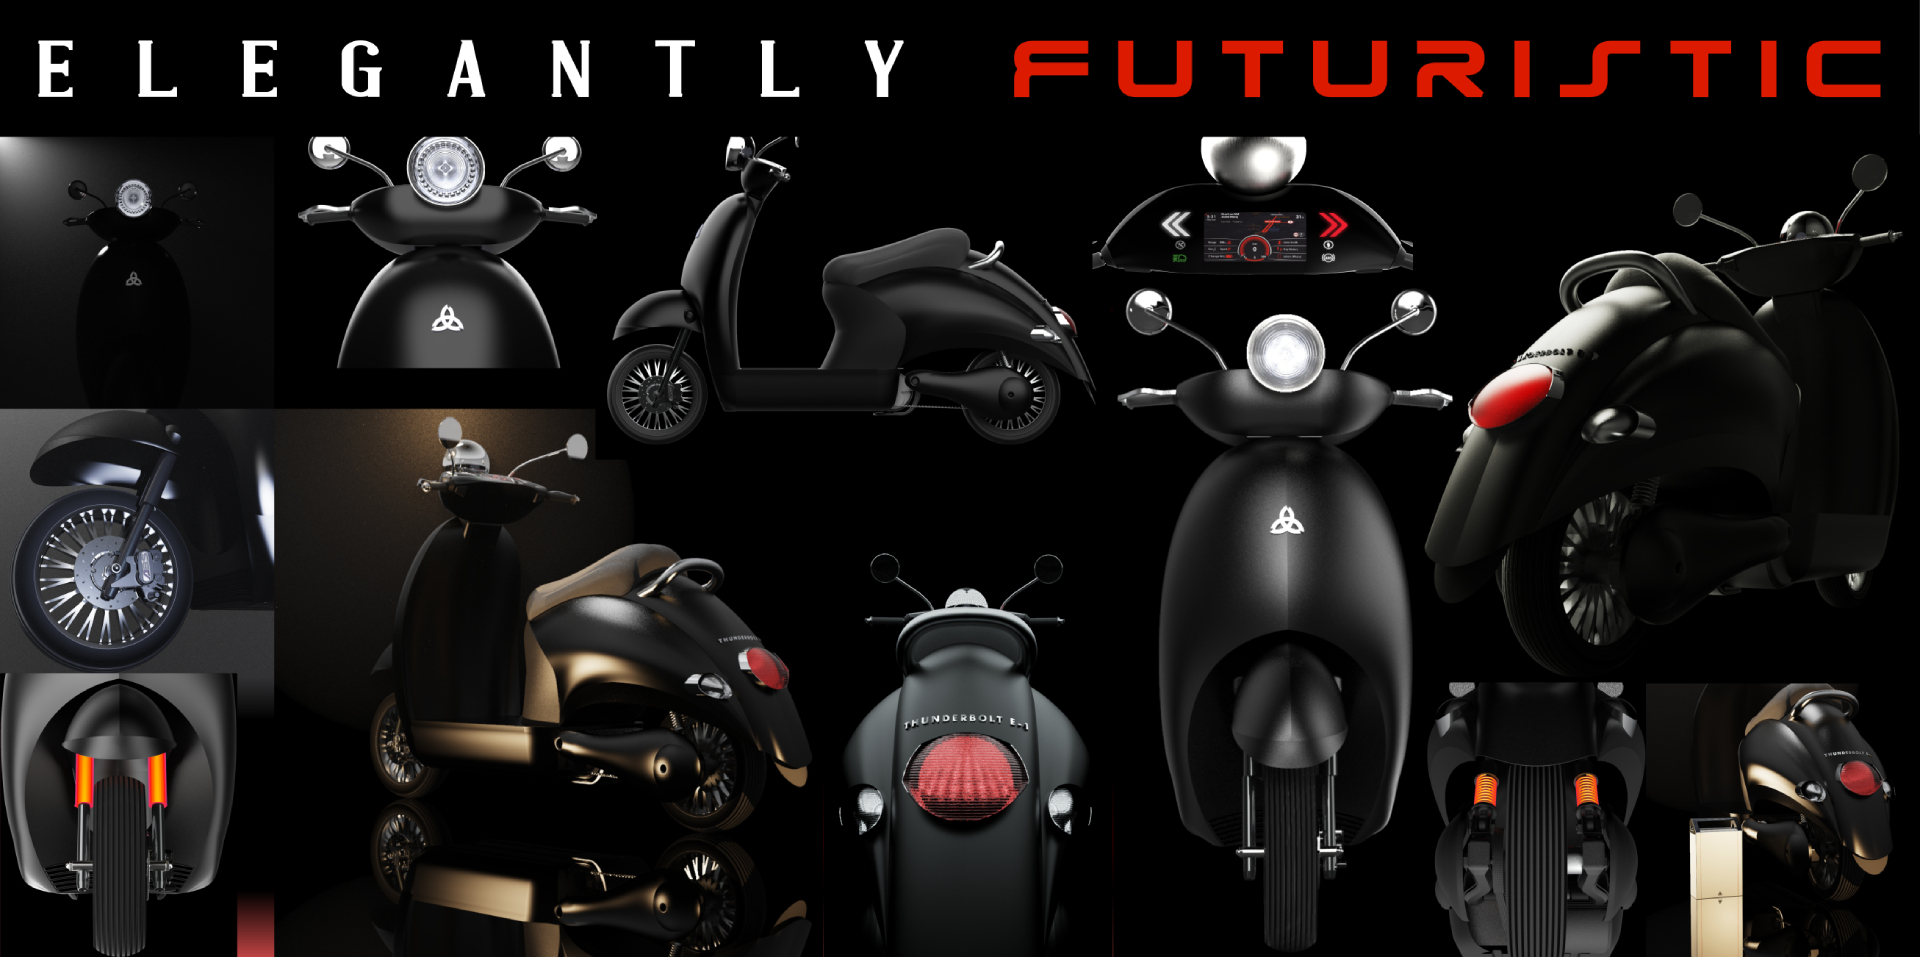 Elegantly Futuristic